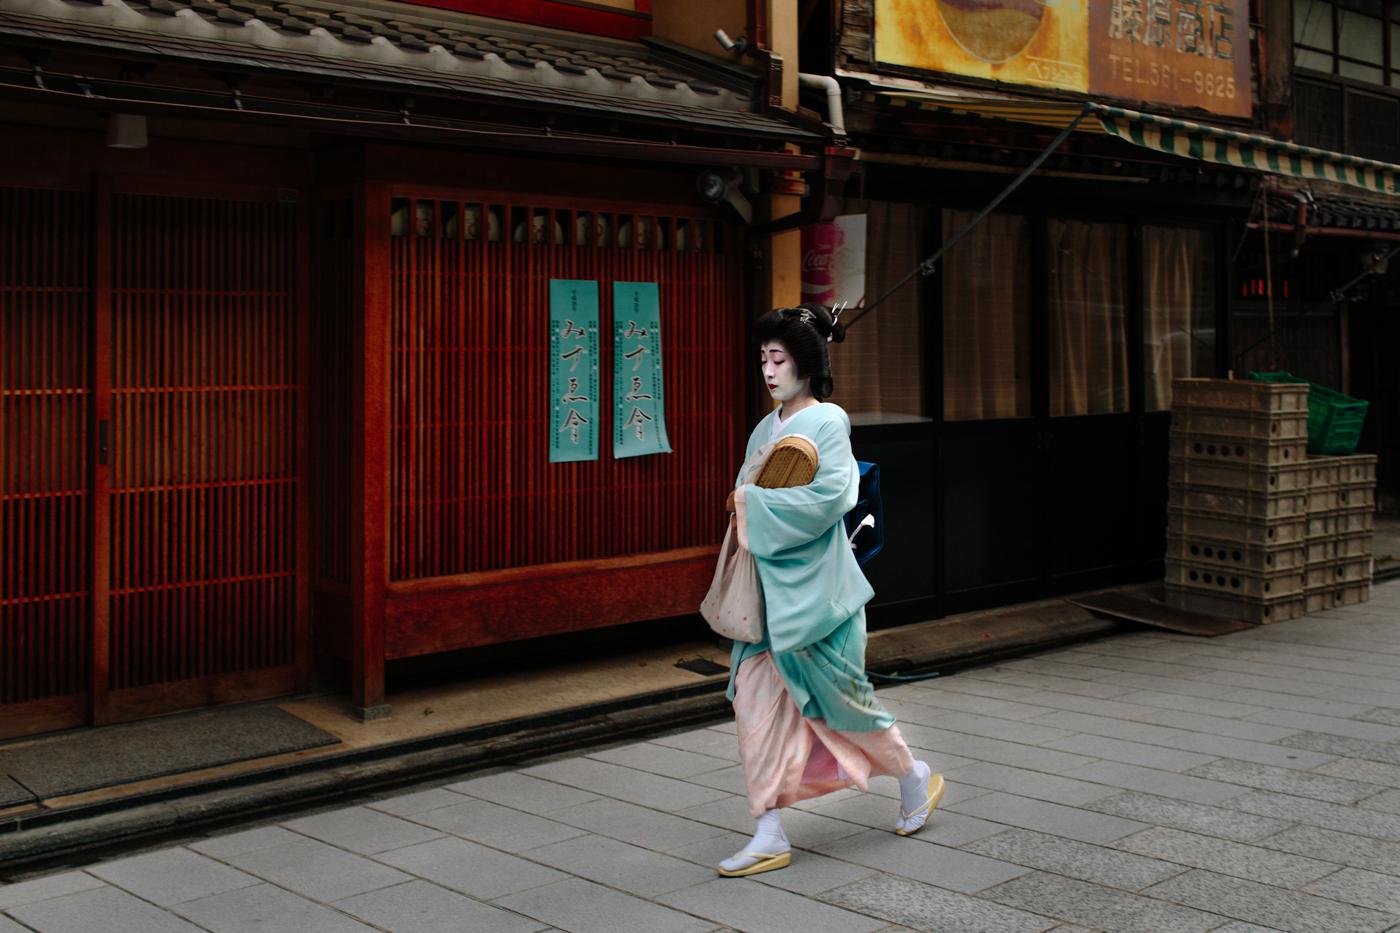 9.19.16_Kyoto_463A5787-Edit.jpg